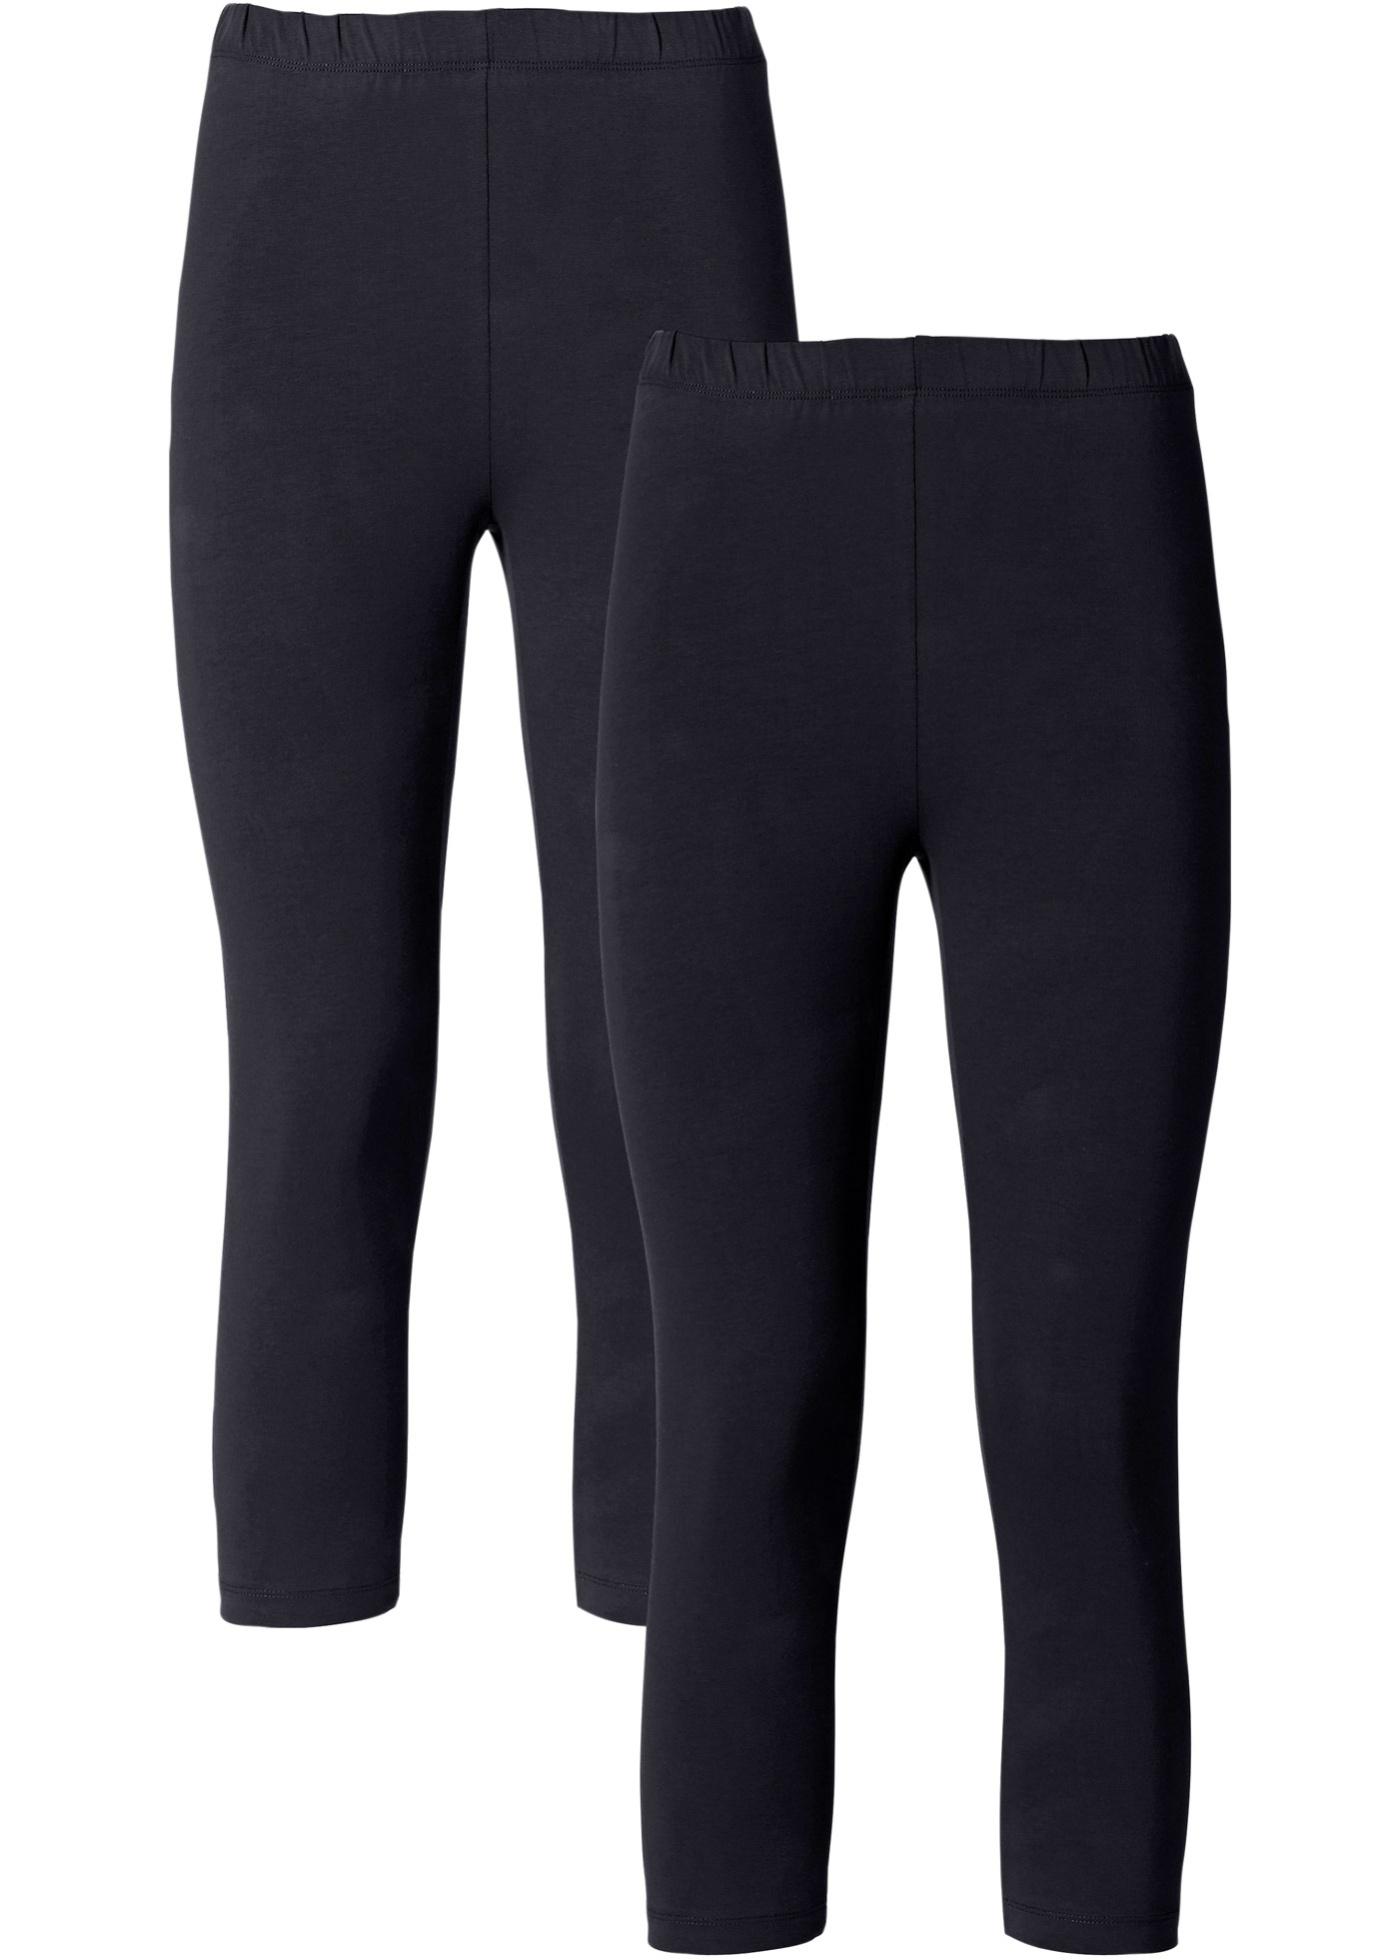 Capri legging (2 db-os csomag)